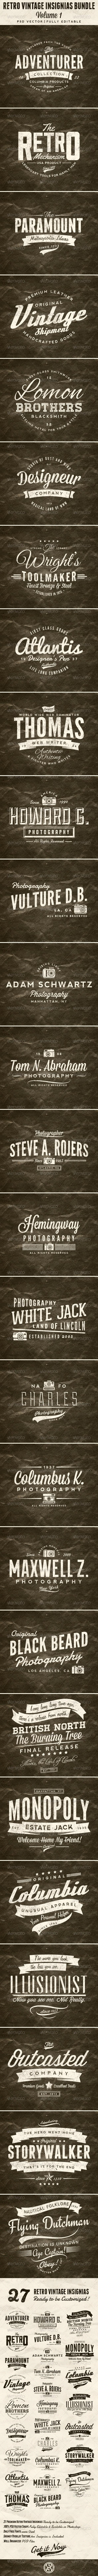 GraphicRiver 27 Retro Vintage Insignias Bundle Volume 1 7383032